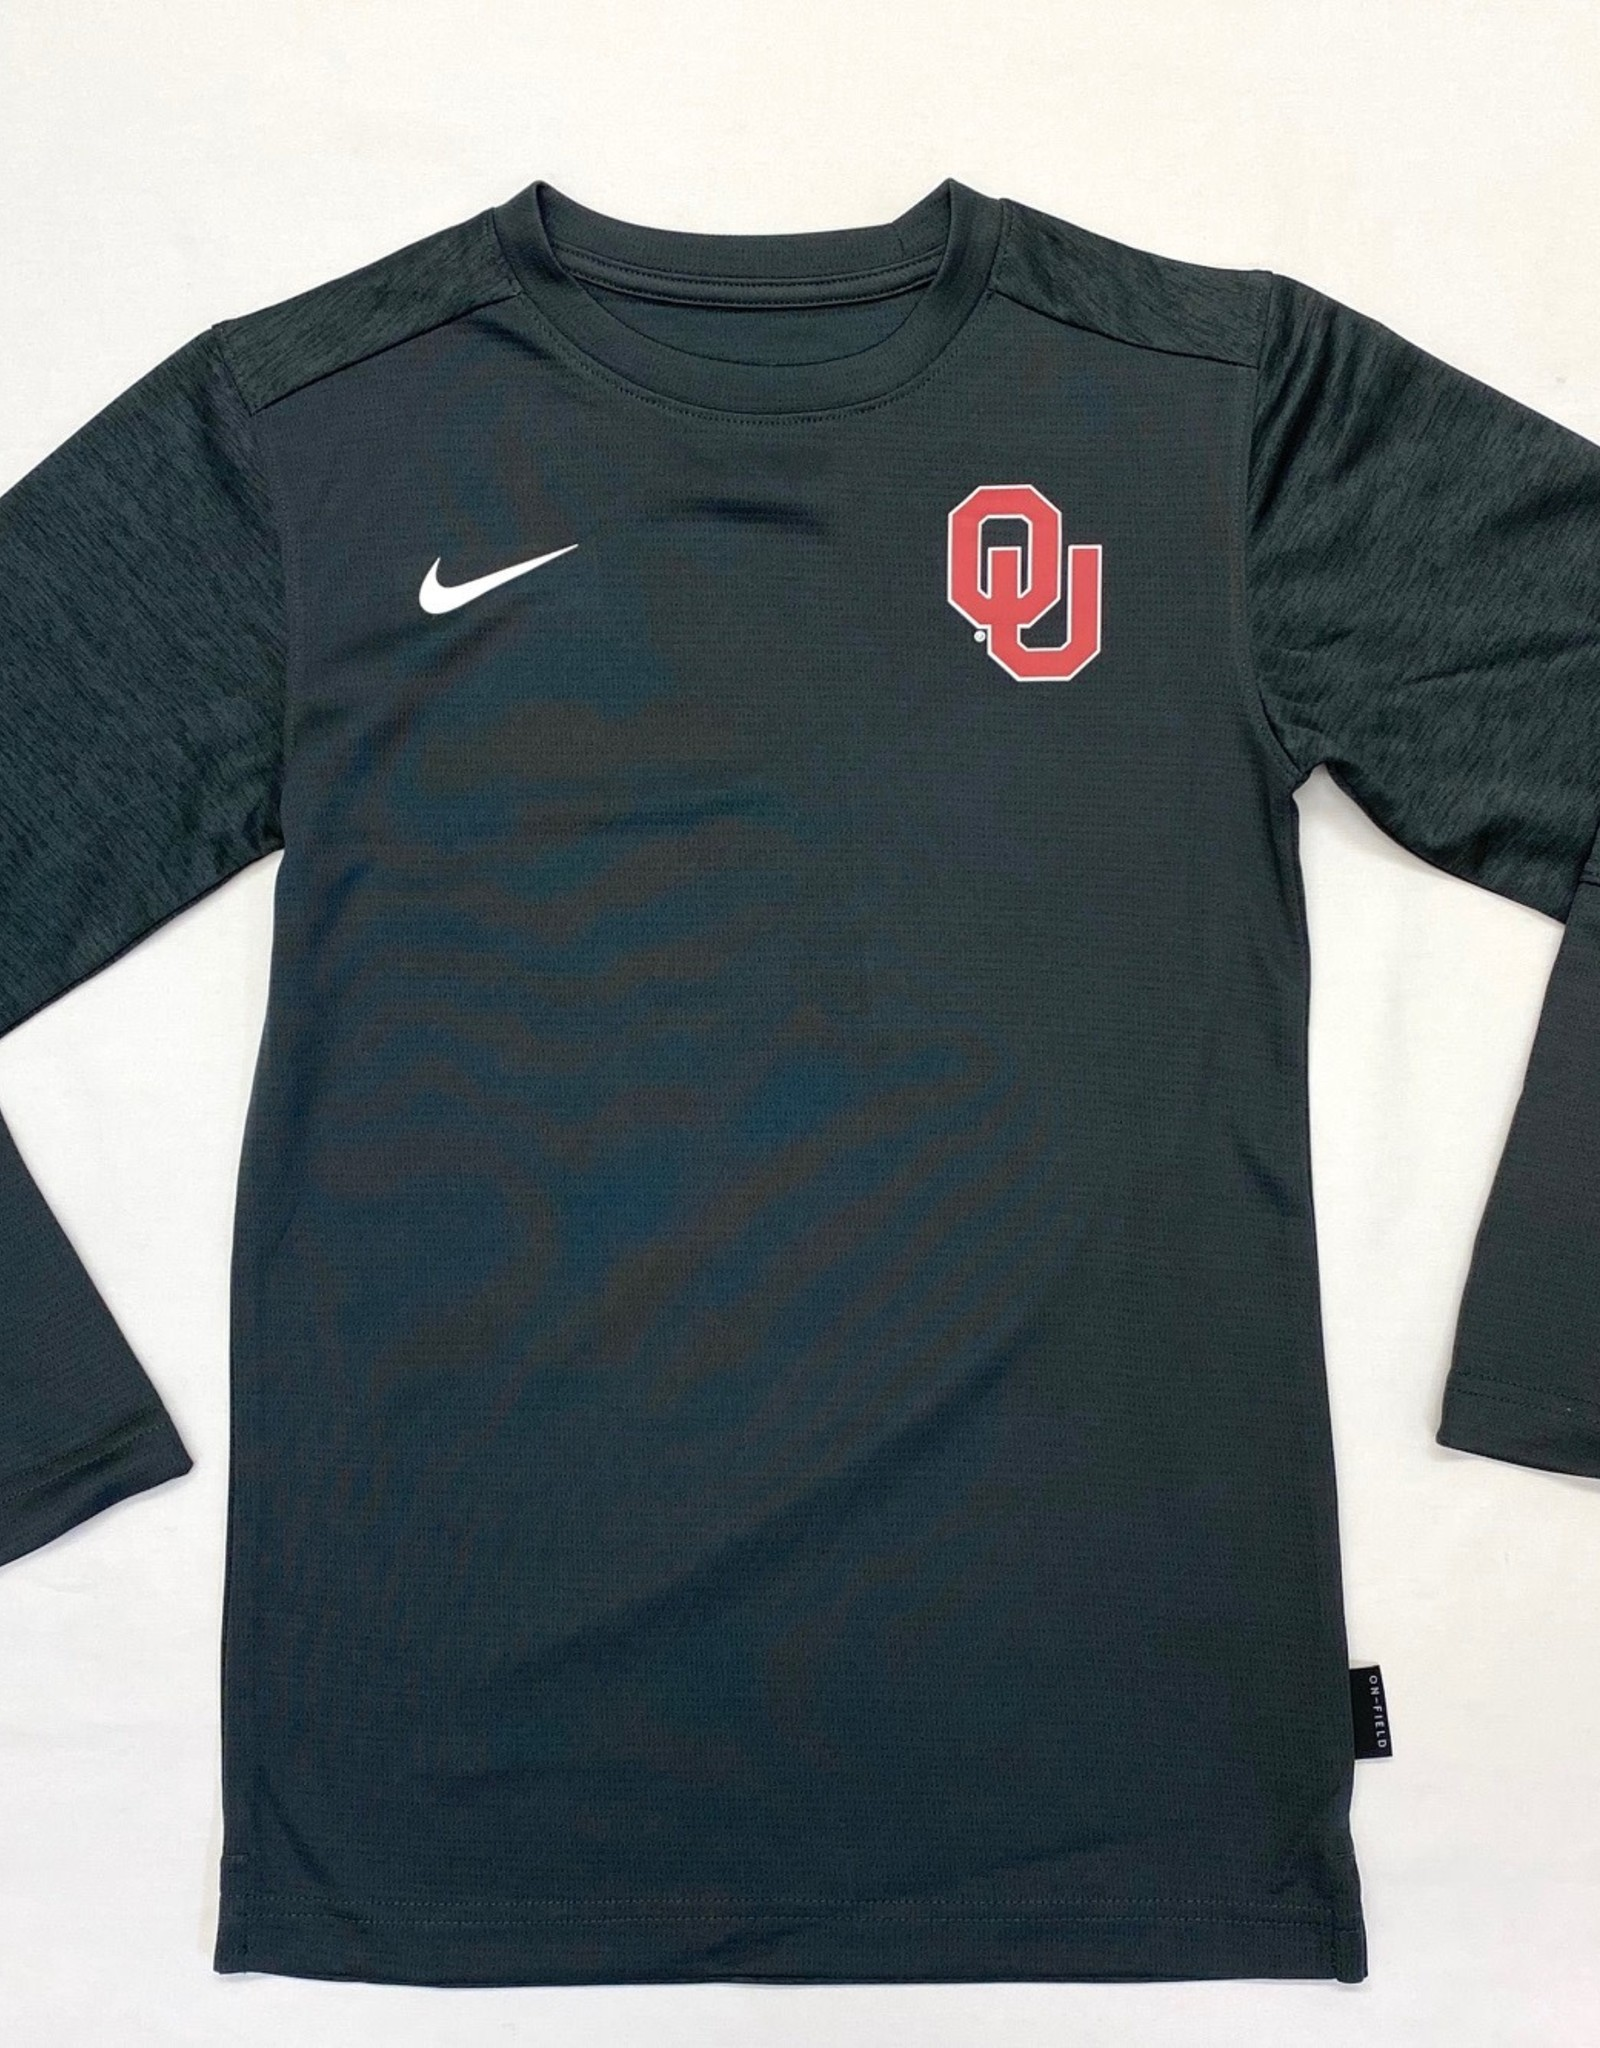 Nike Youth Nike Anthracite OU Long-Sleeve Coach Tee